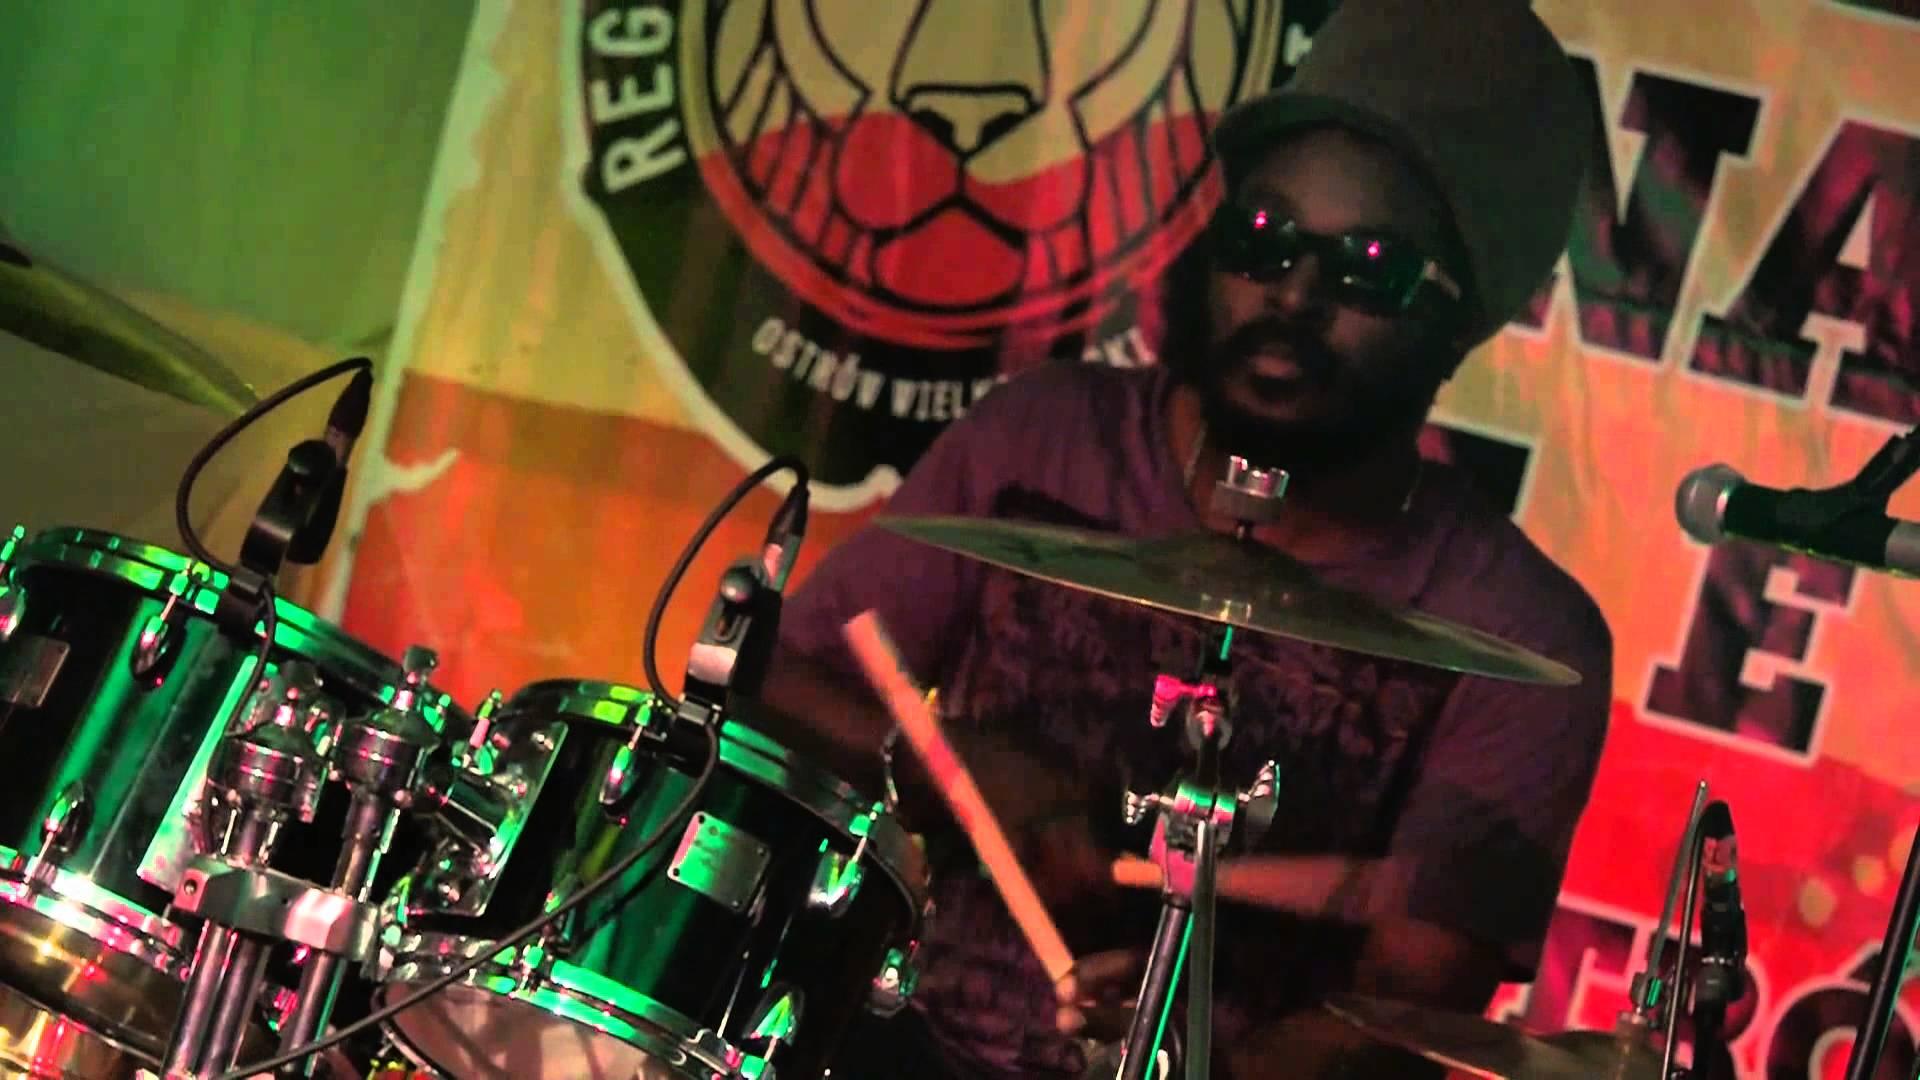 Iba Mahr & Dubtonic Kru - Reggae na Piaskach 2014 [7/20/2014]